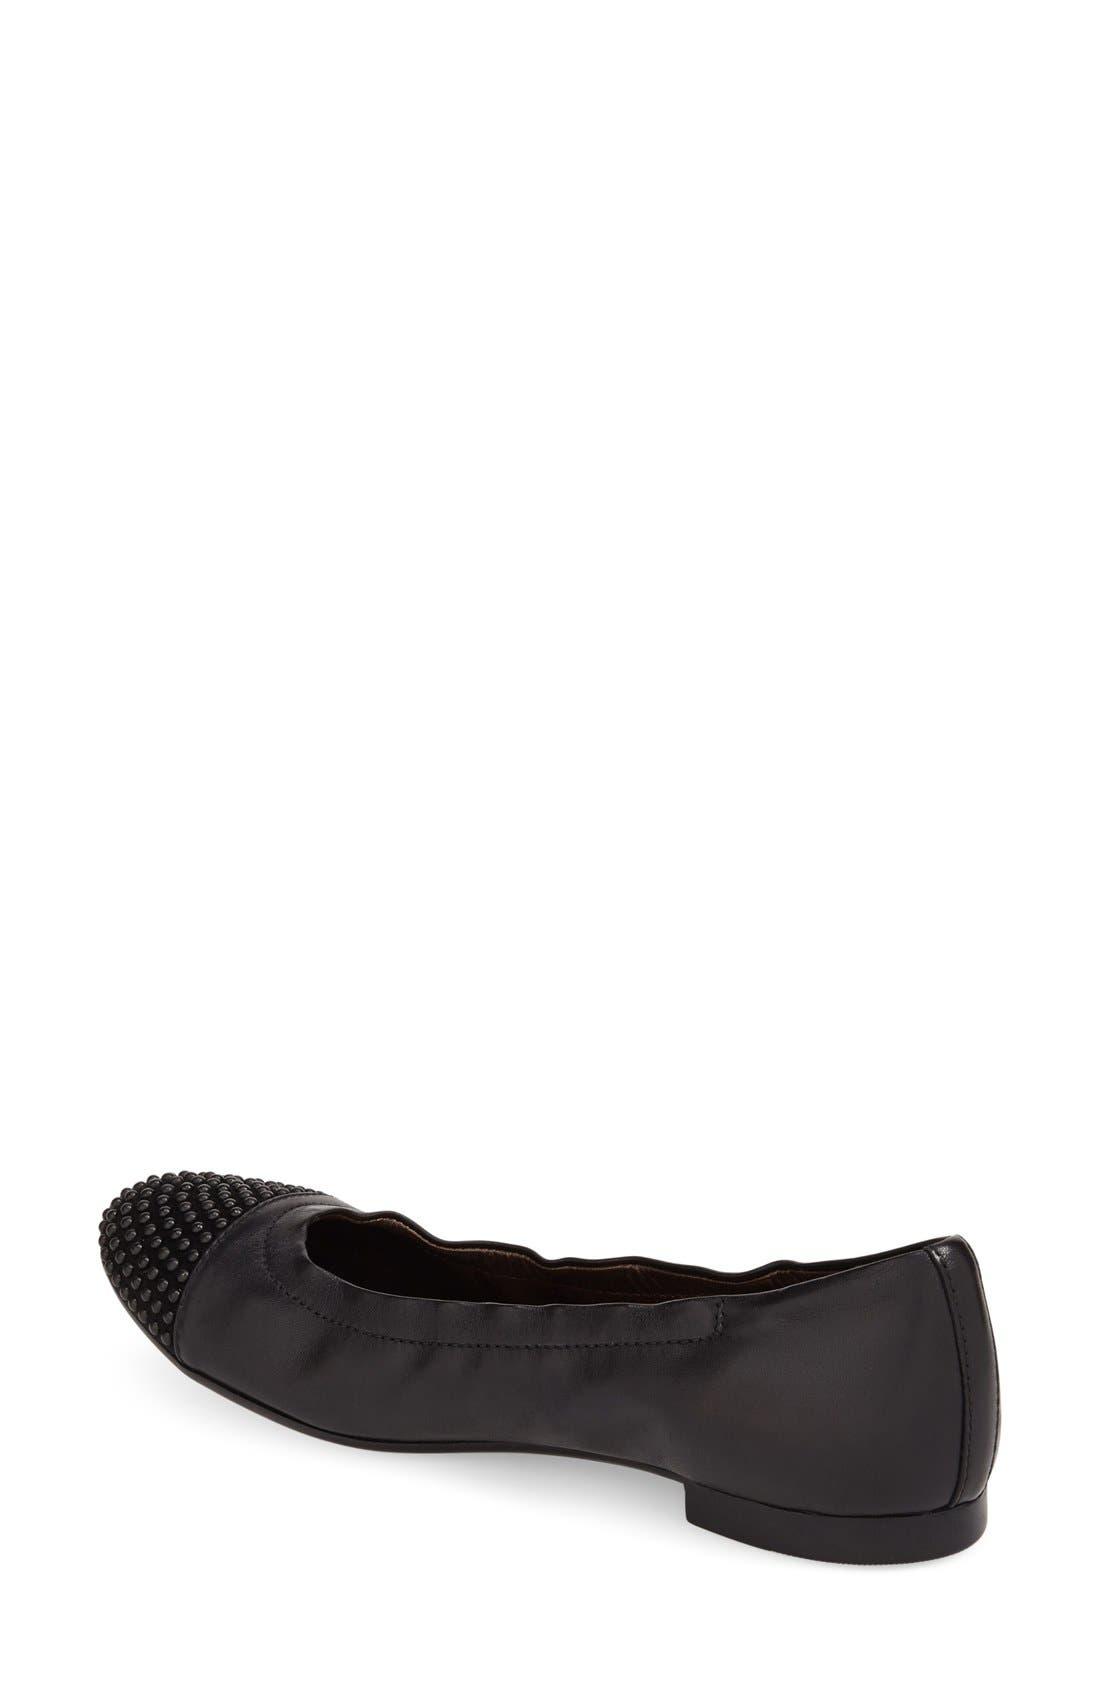 'Blakely' Studded Cap Toe Ballet Flat,                             Alternate thumbnail 3, color,                             001